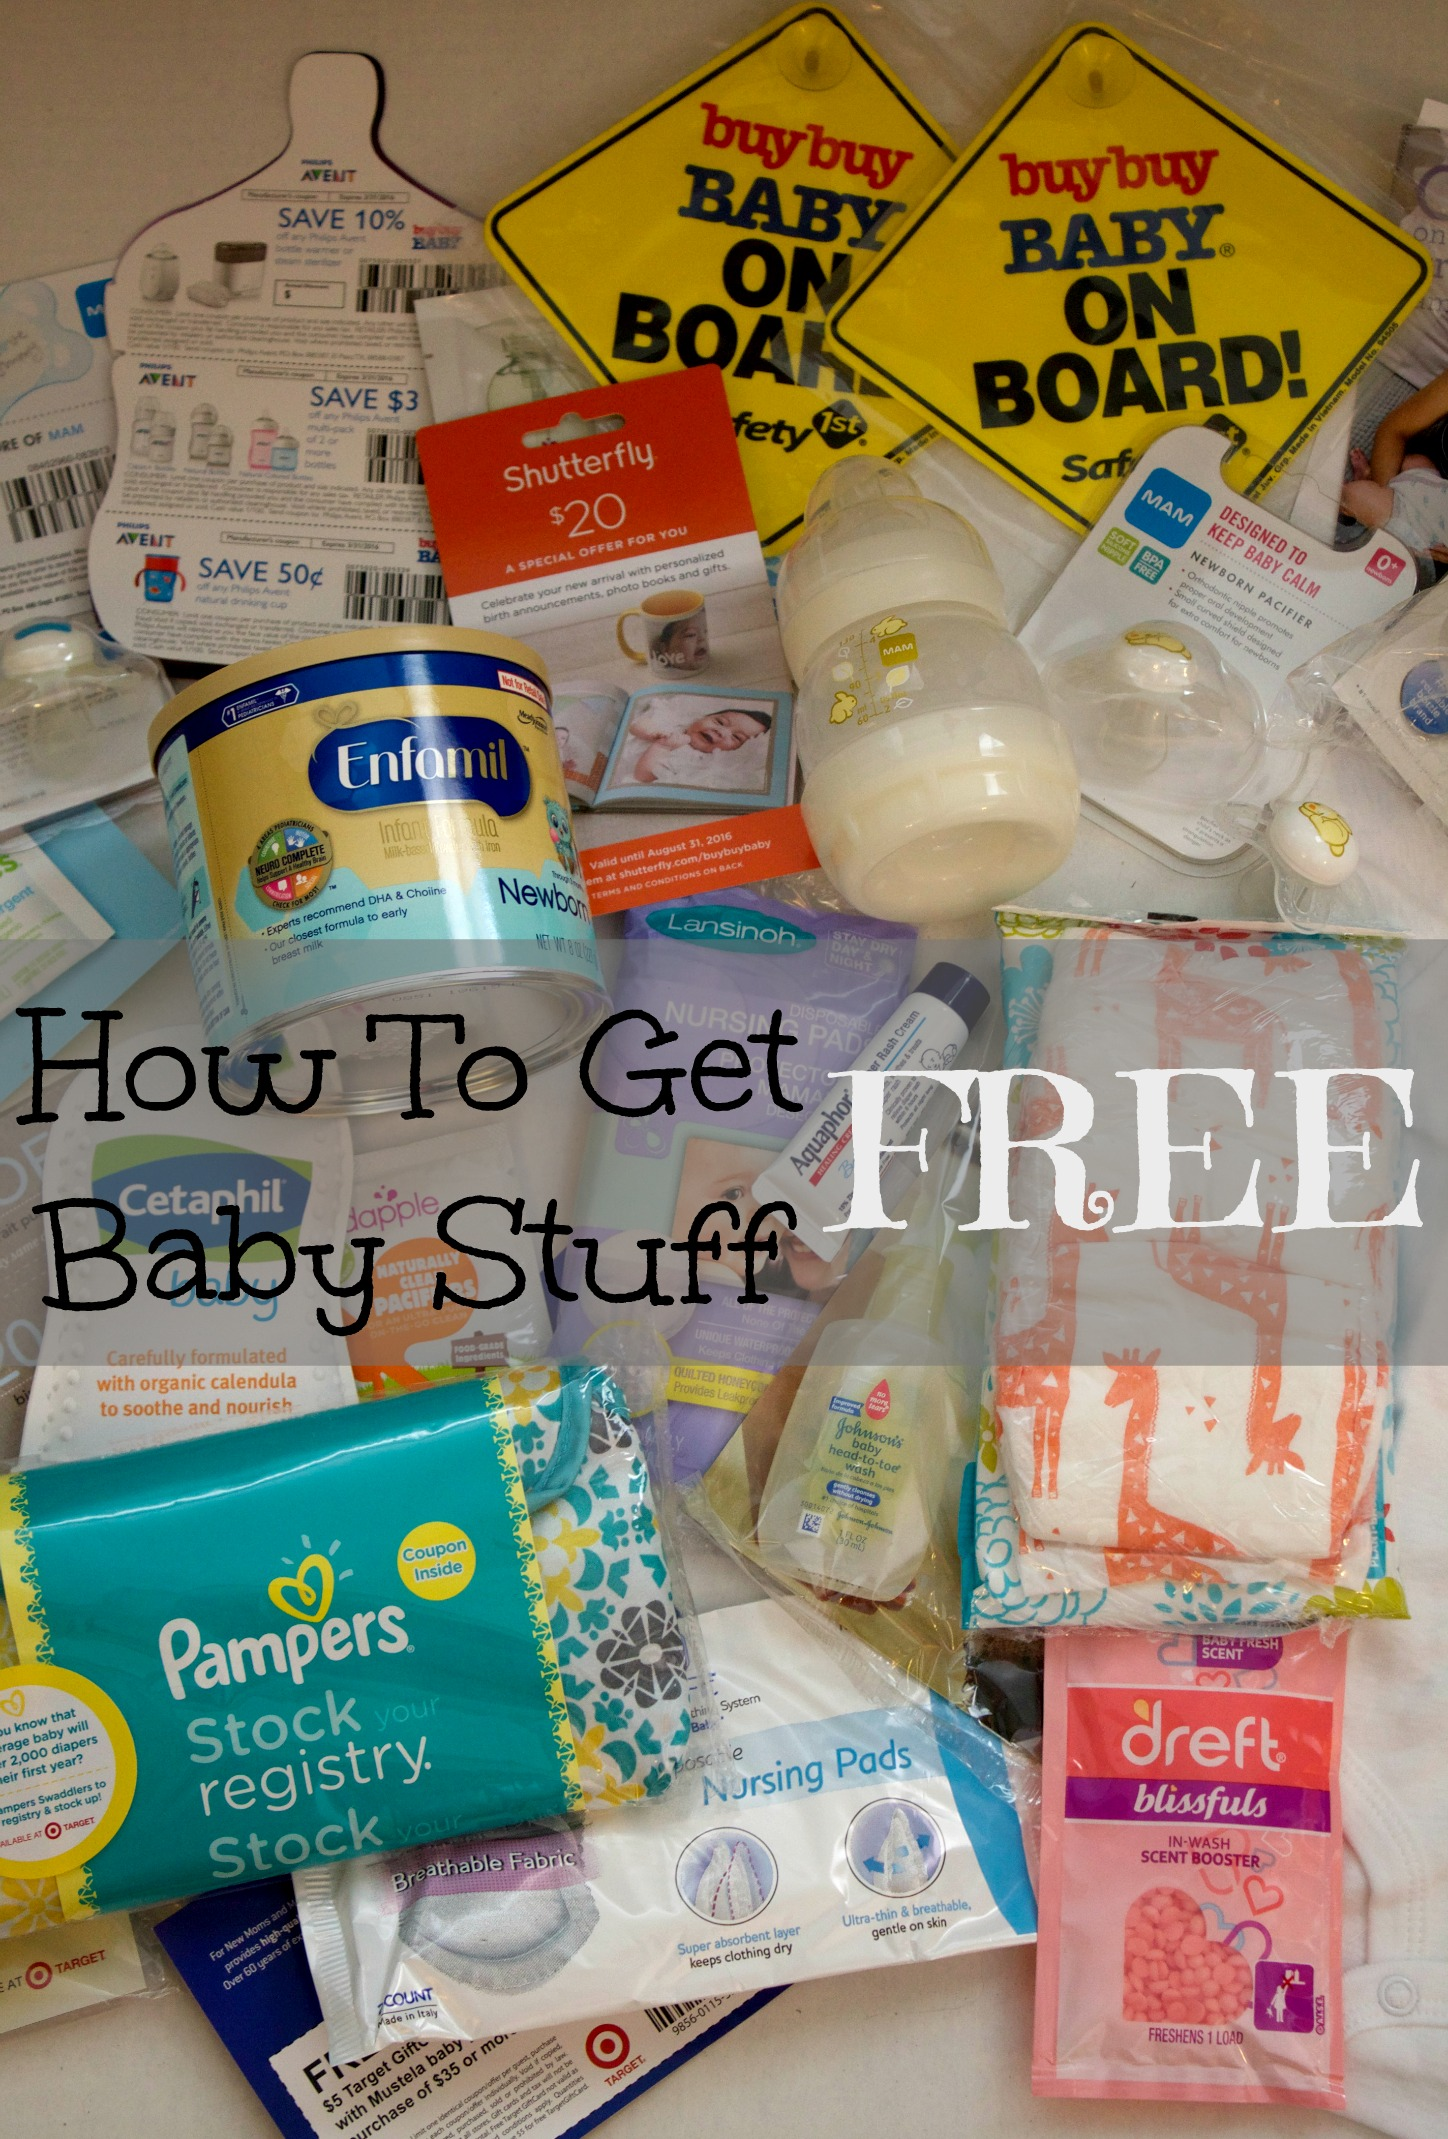 May 21, · How to get FREE Baby stuffPRODUCTS: Enfamil formula 0549sahibi.tk